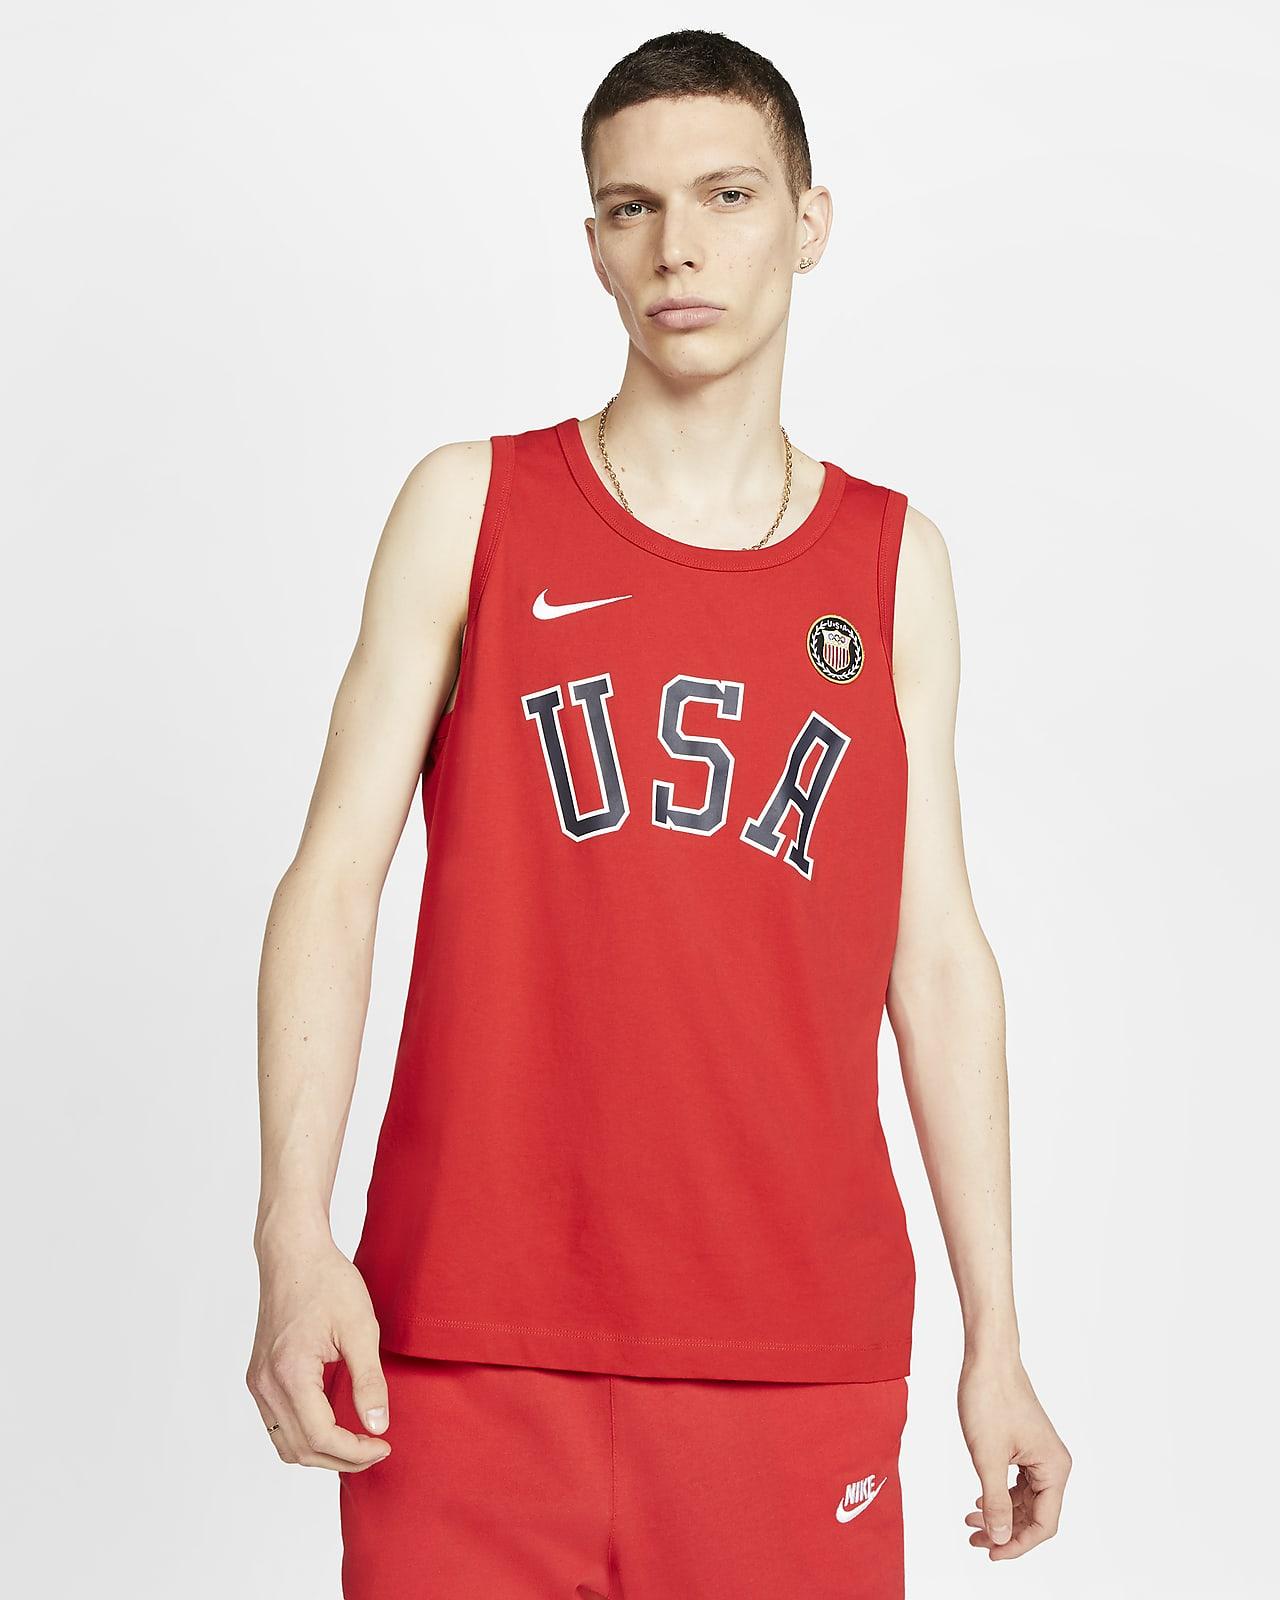 Nike Team USA Men's Tank Top